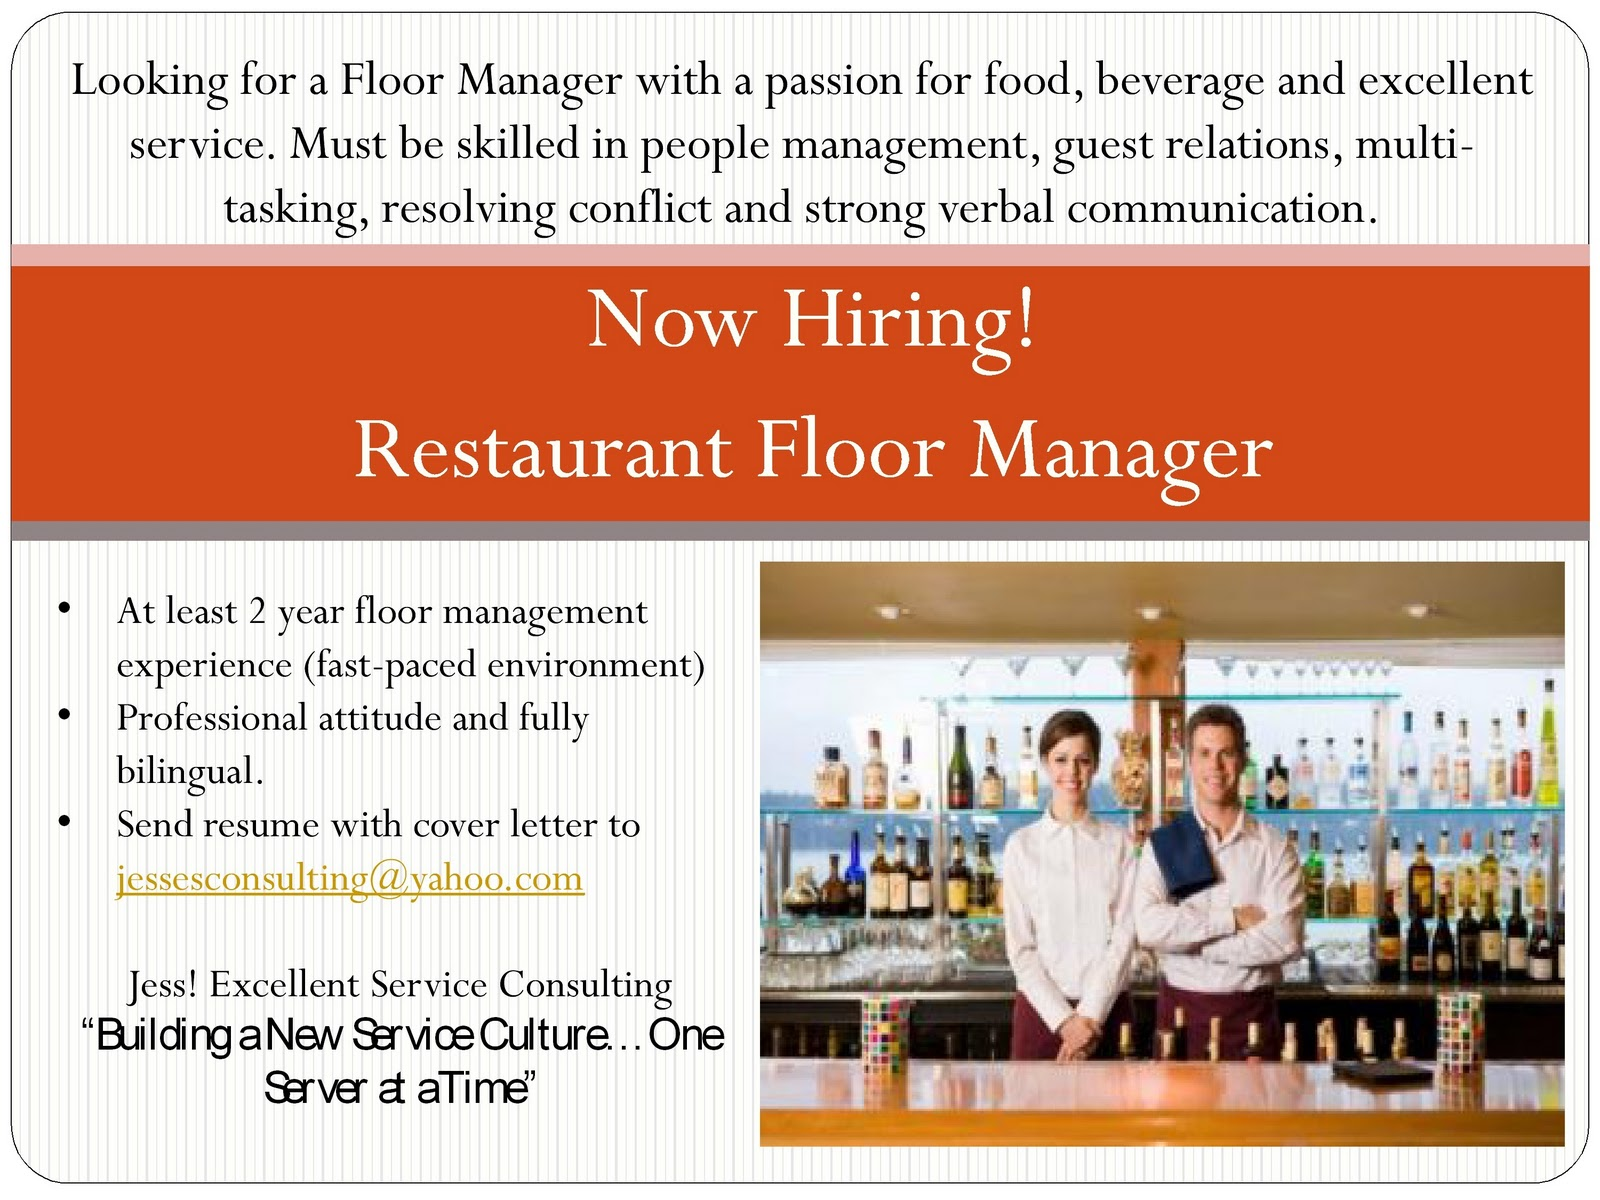 Professional Food Service Management